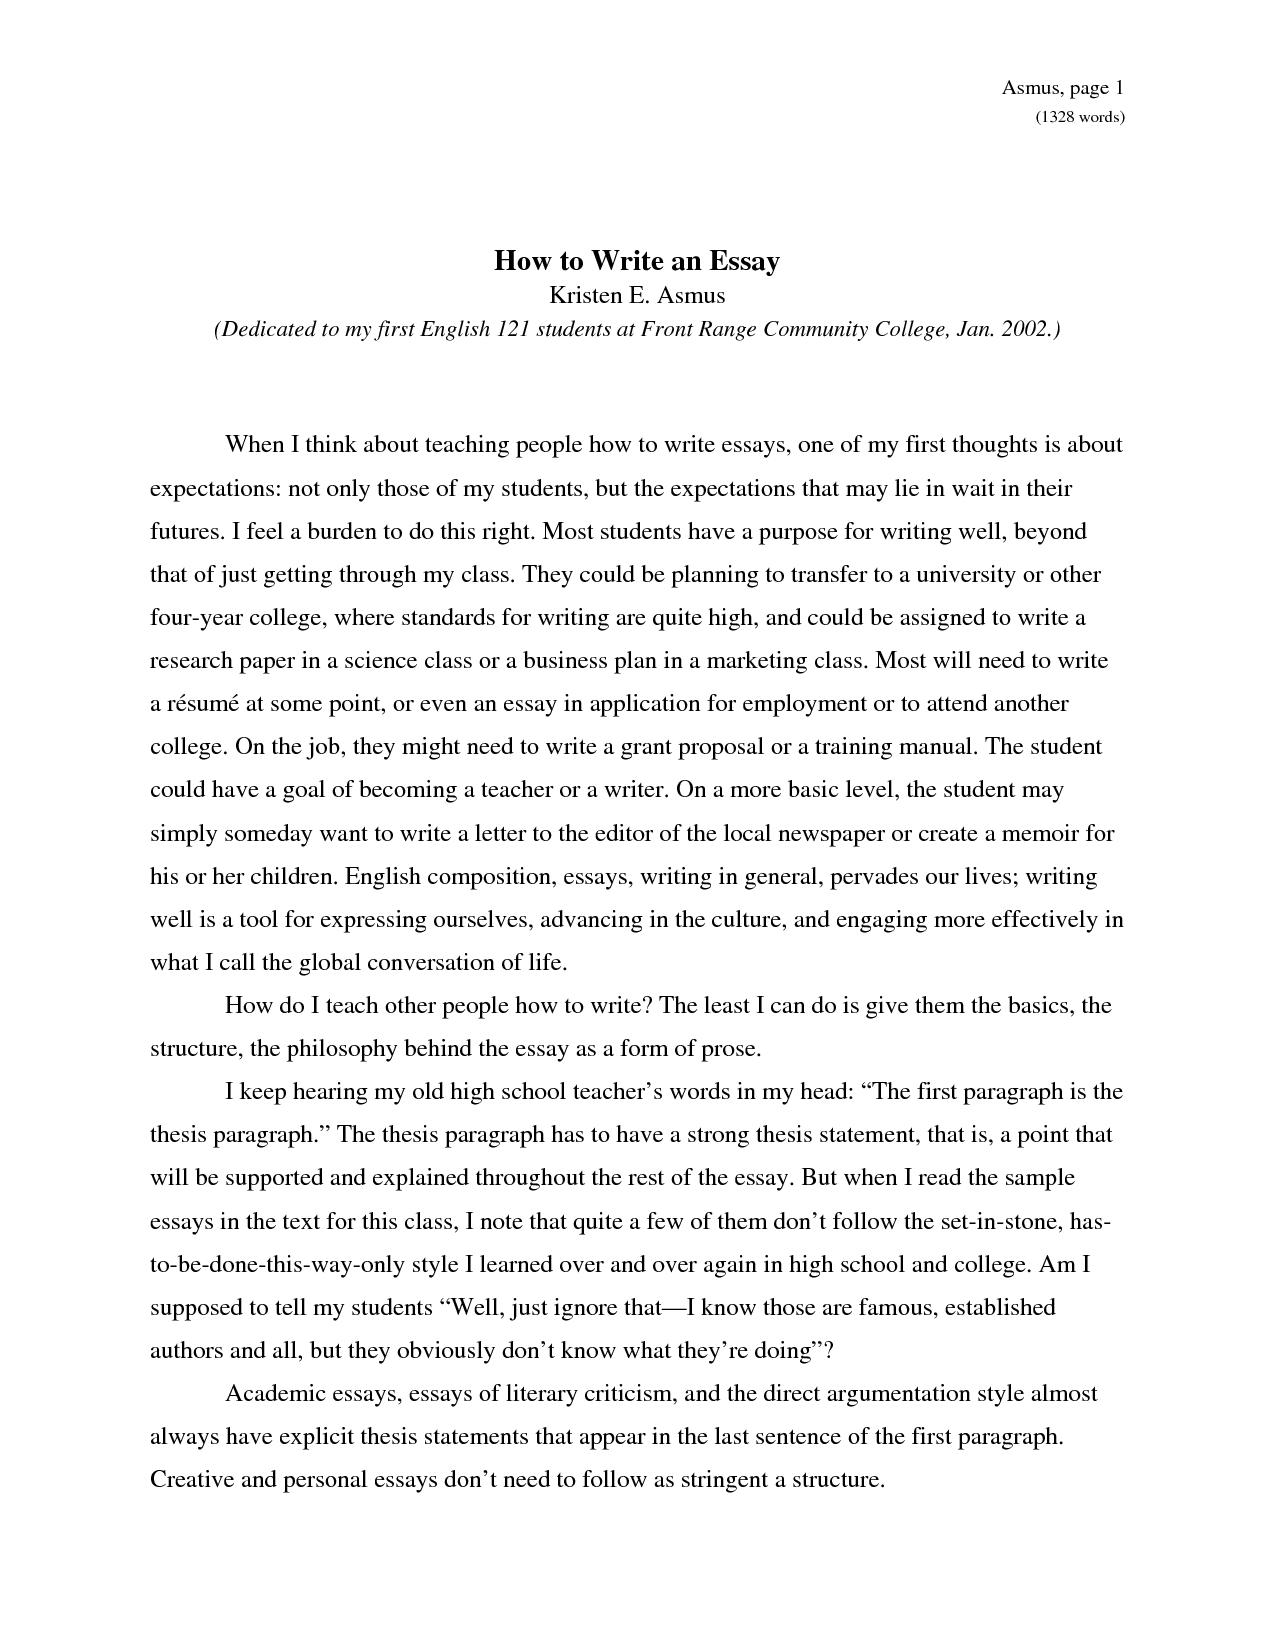 how to write a transfer essay to school